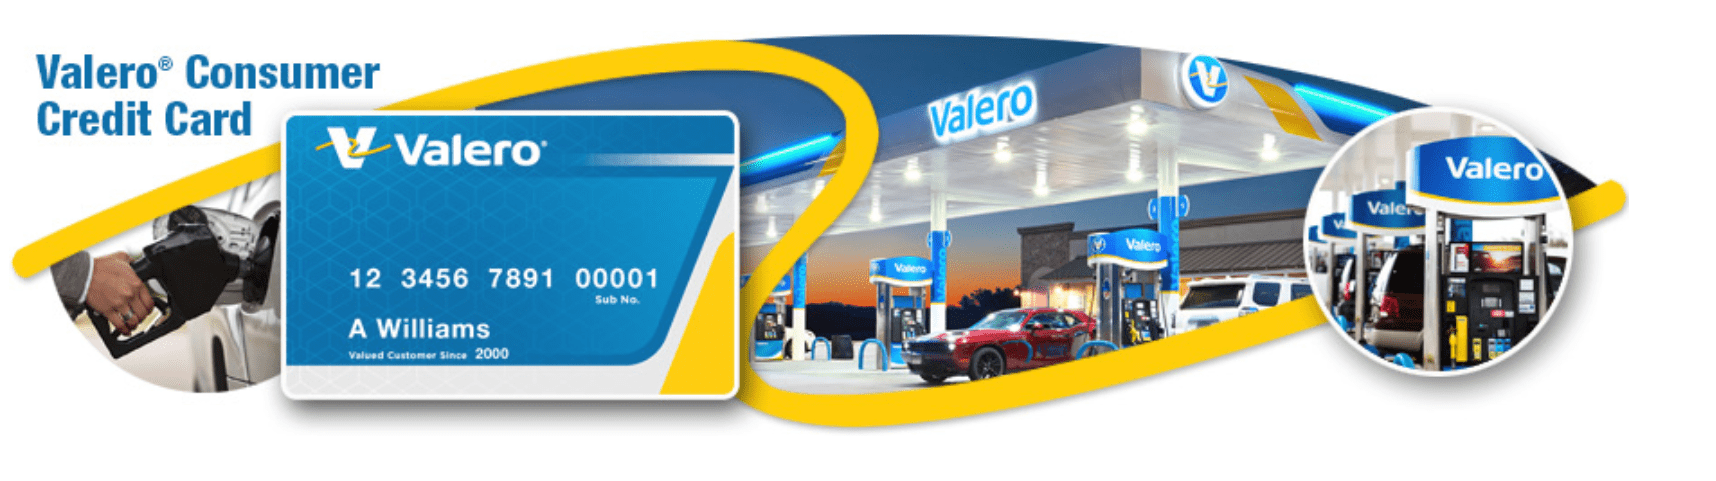 www.valero.com/creditcard payment – Valero Fleet Login